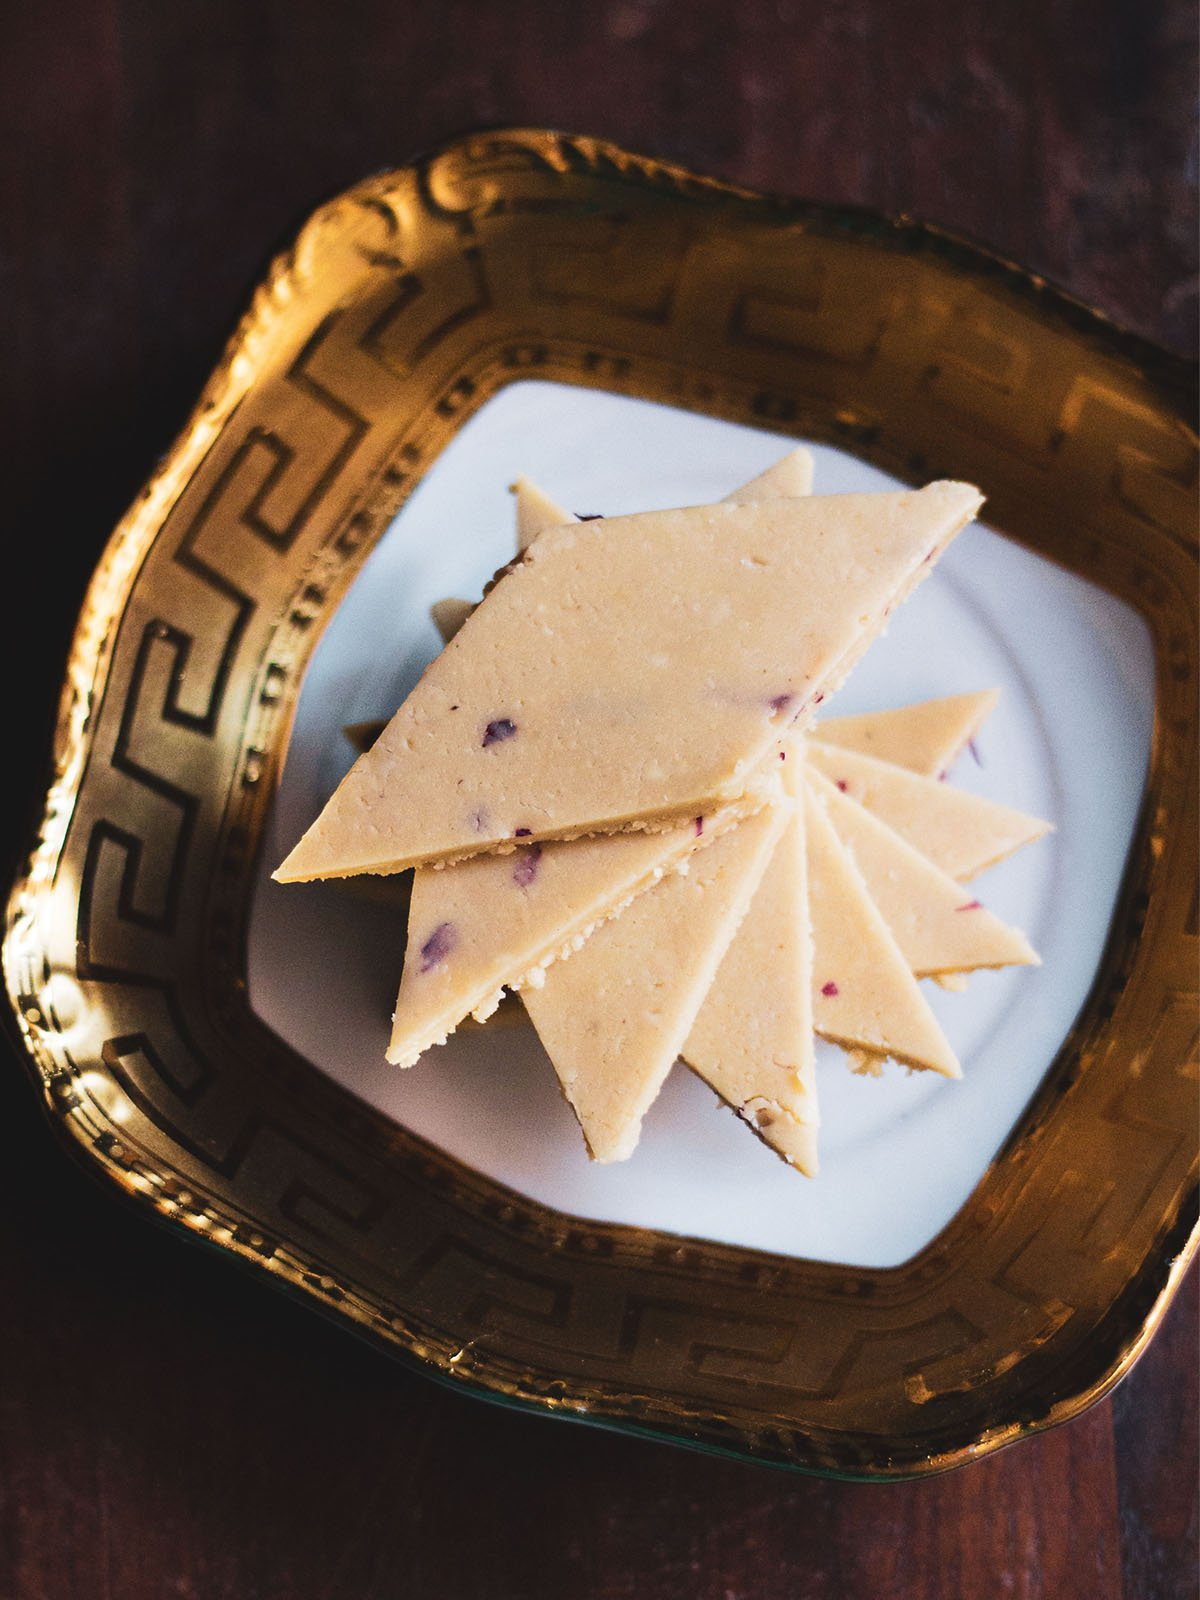 kaju katli stacked spirally on a golden rimmed white square plate